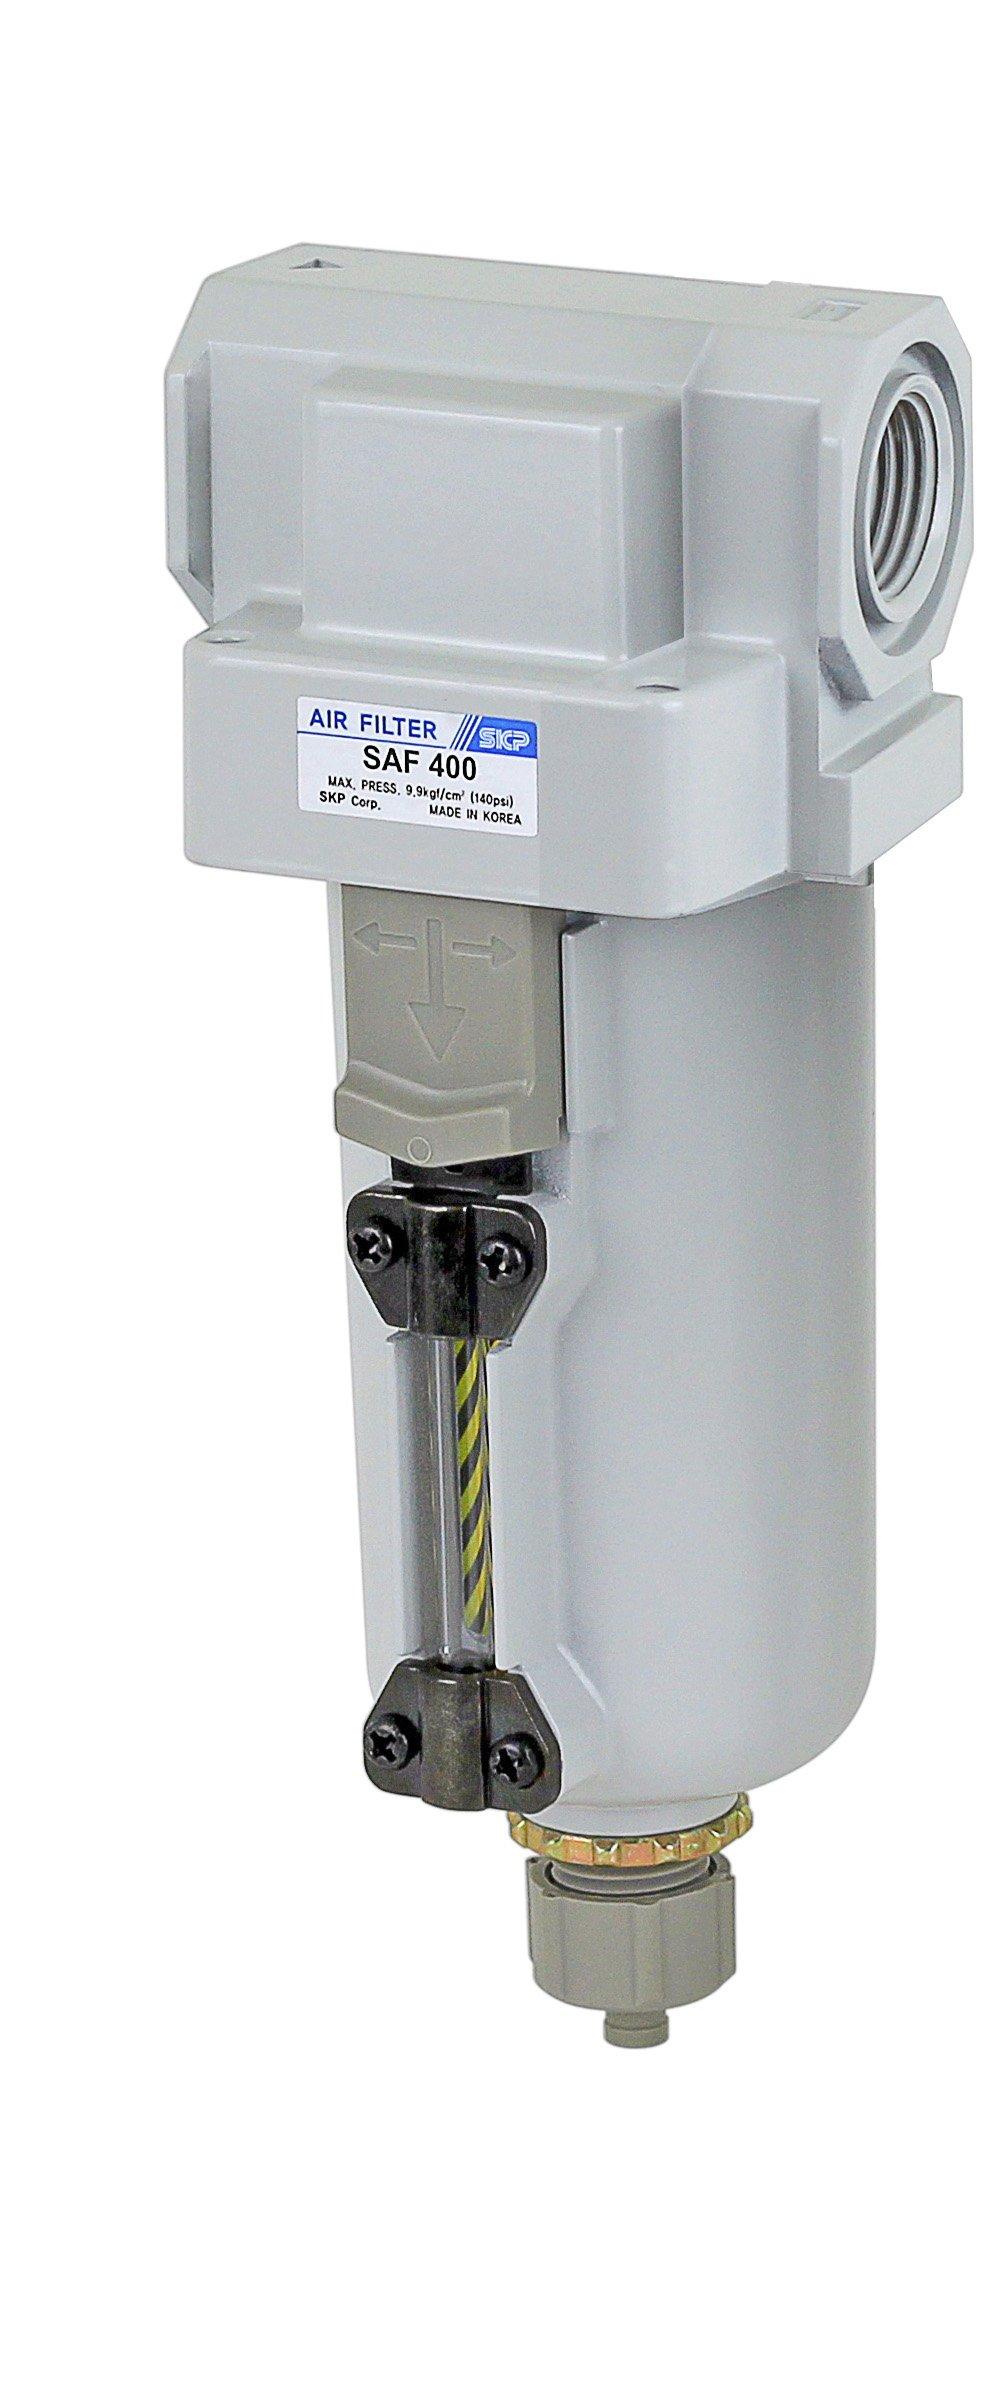 PneumaticPlus SAF400-N04B-MEP Compressed Air Particulate Filter 1/2'' NPT, 10 Micron - Metal Bowl w/Manual Drain, Bracket